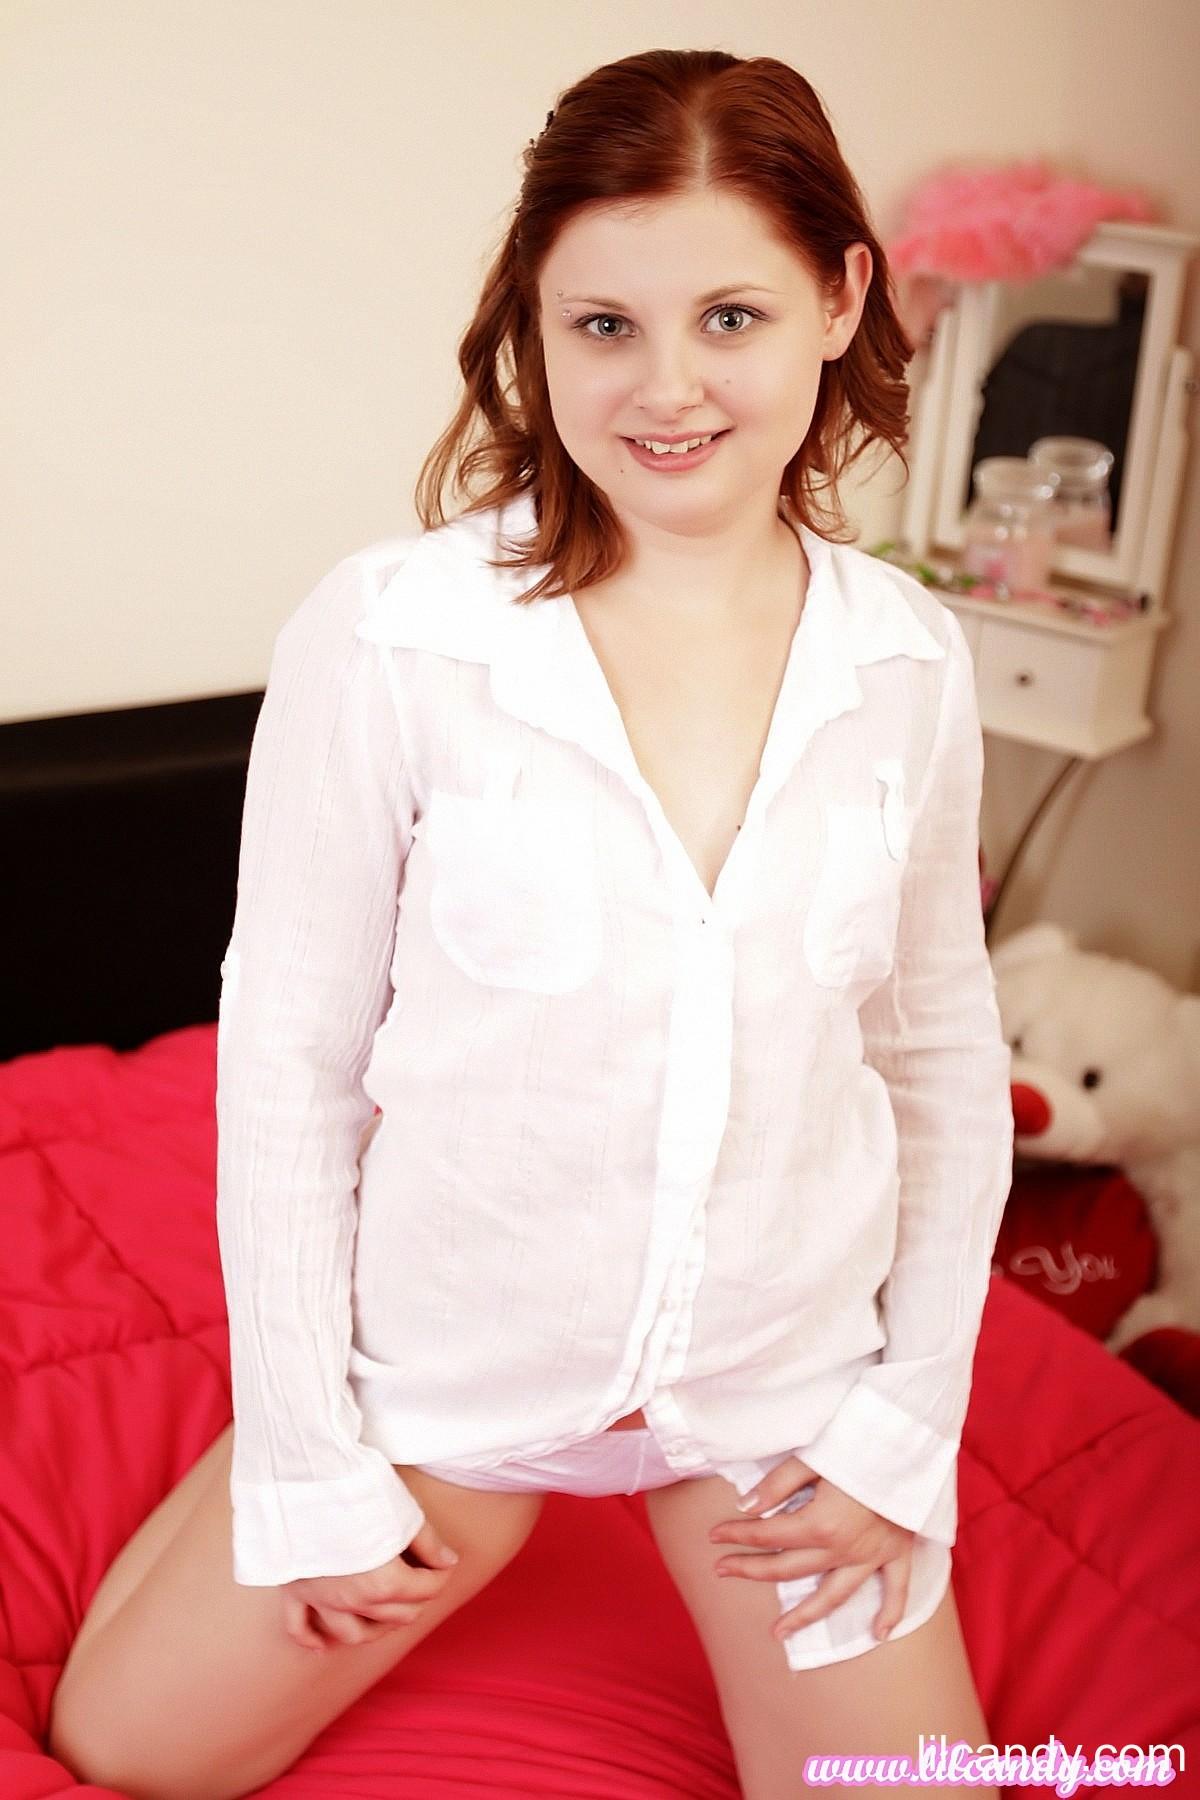 Lil Candy - White Dress Shirt 118620-2653